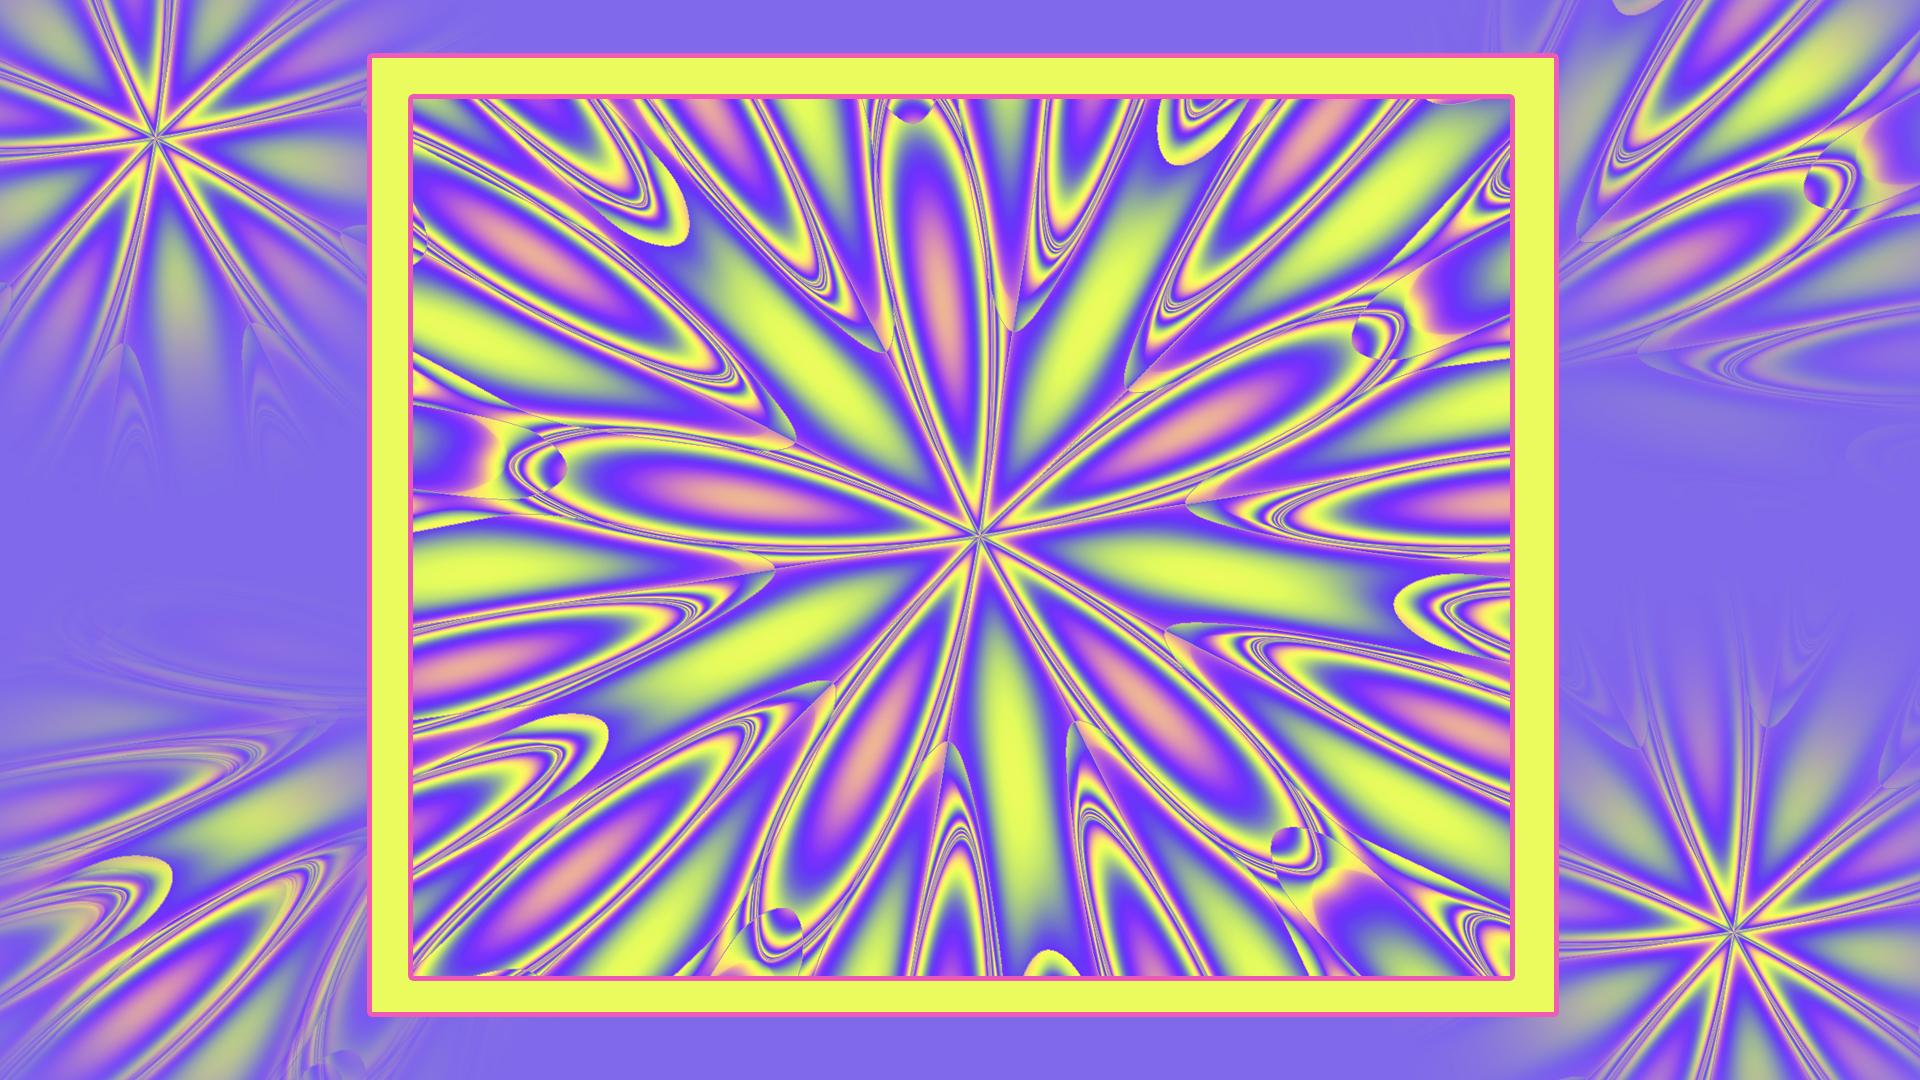 Artistic Digital Art Colors Pattern 1920x1080